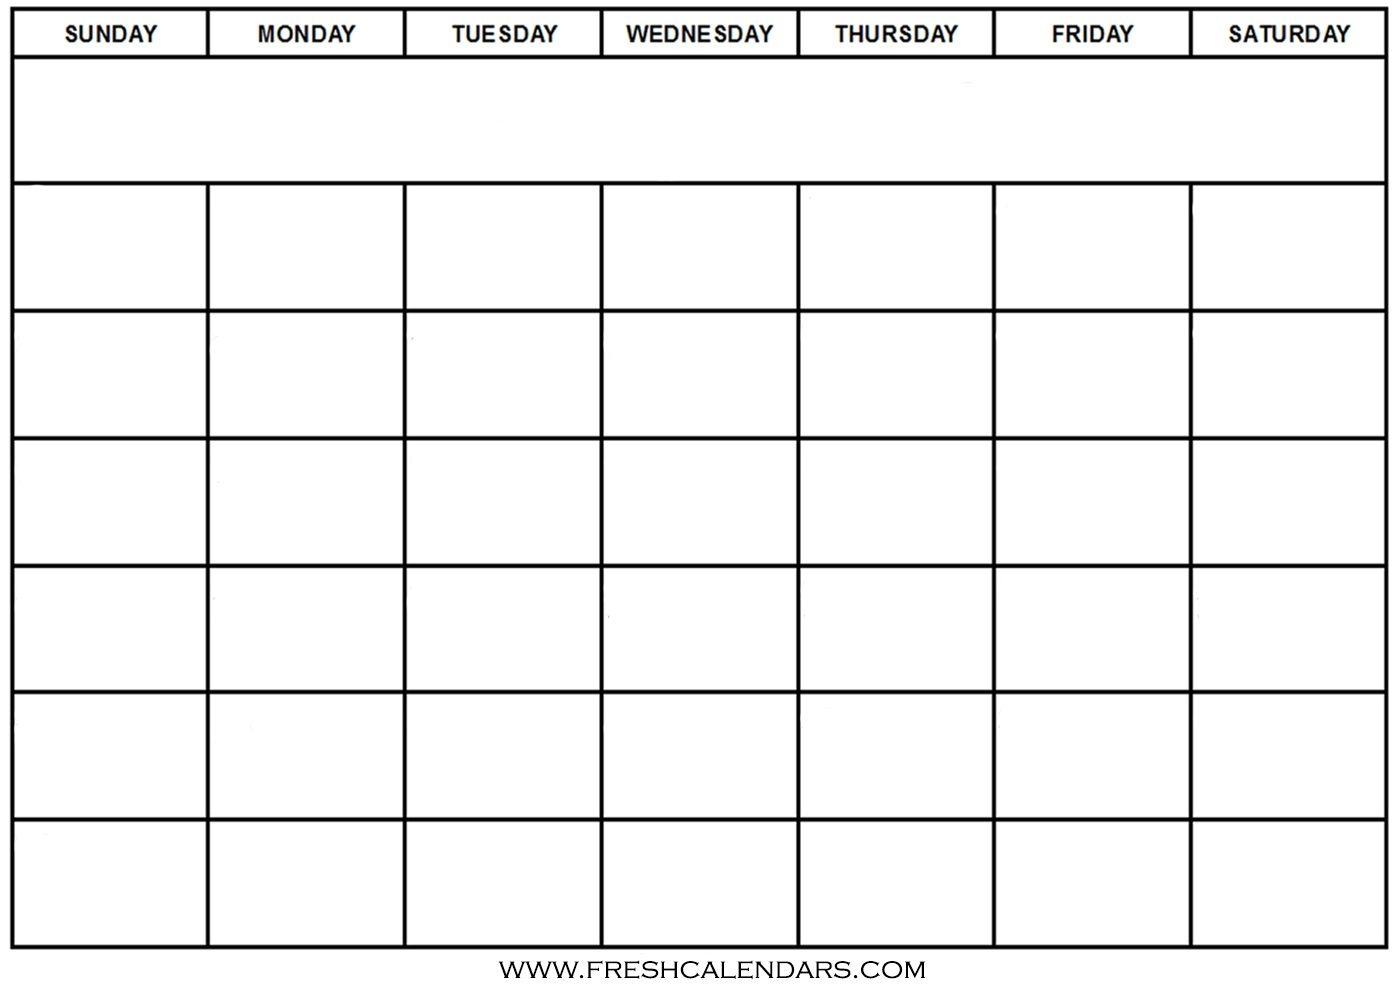 Blank Calendar: Wonderfully Printable 2019 Templates pertaining to Free Printable Blank Calendars To Fill In